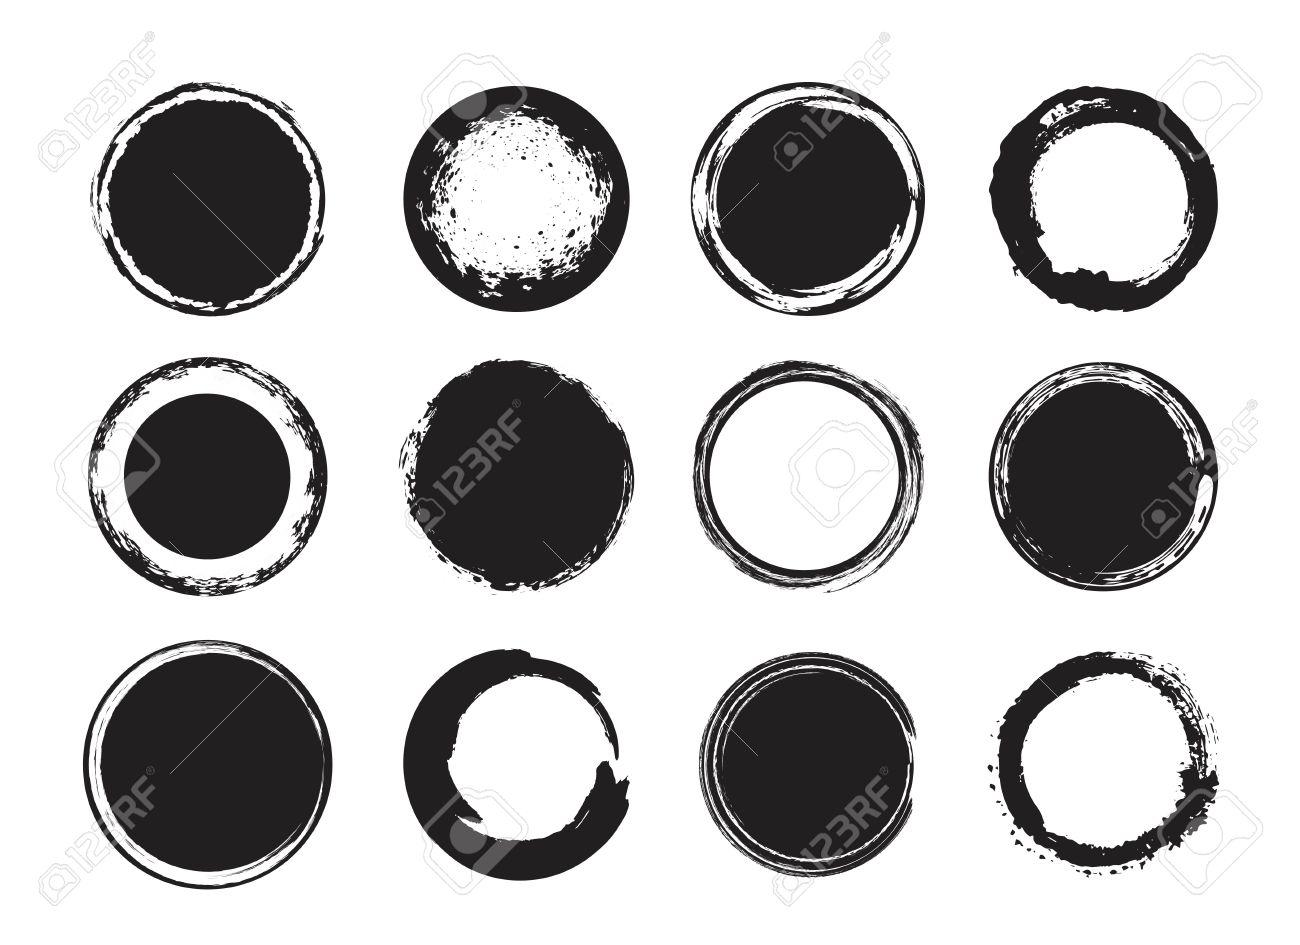 Artistic creative painted circle, label, branding. Black enso zen round. Vector illustration. - 64691951